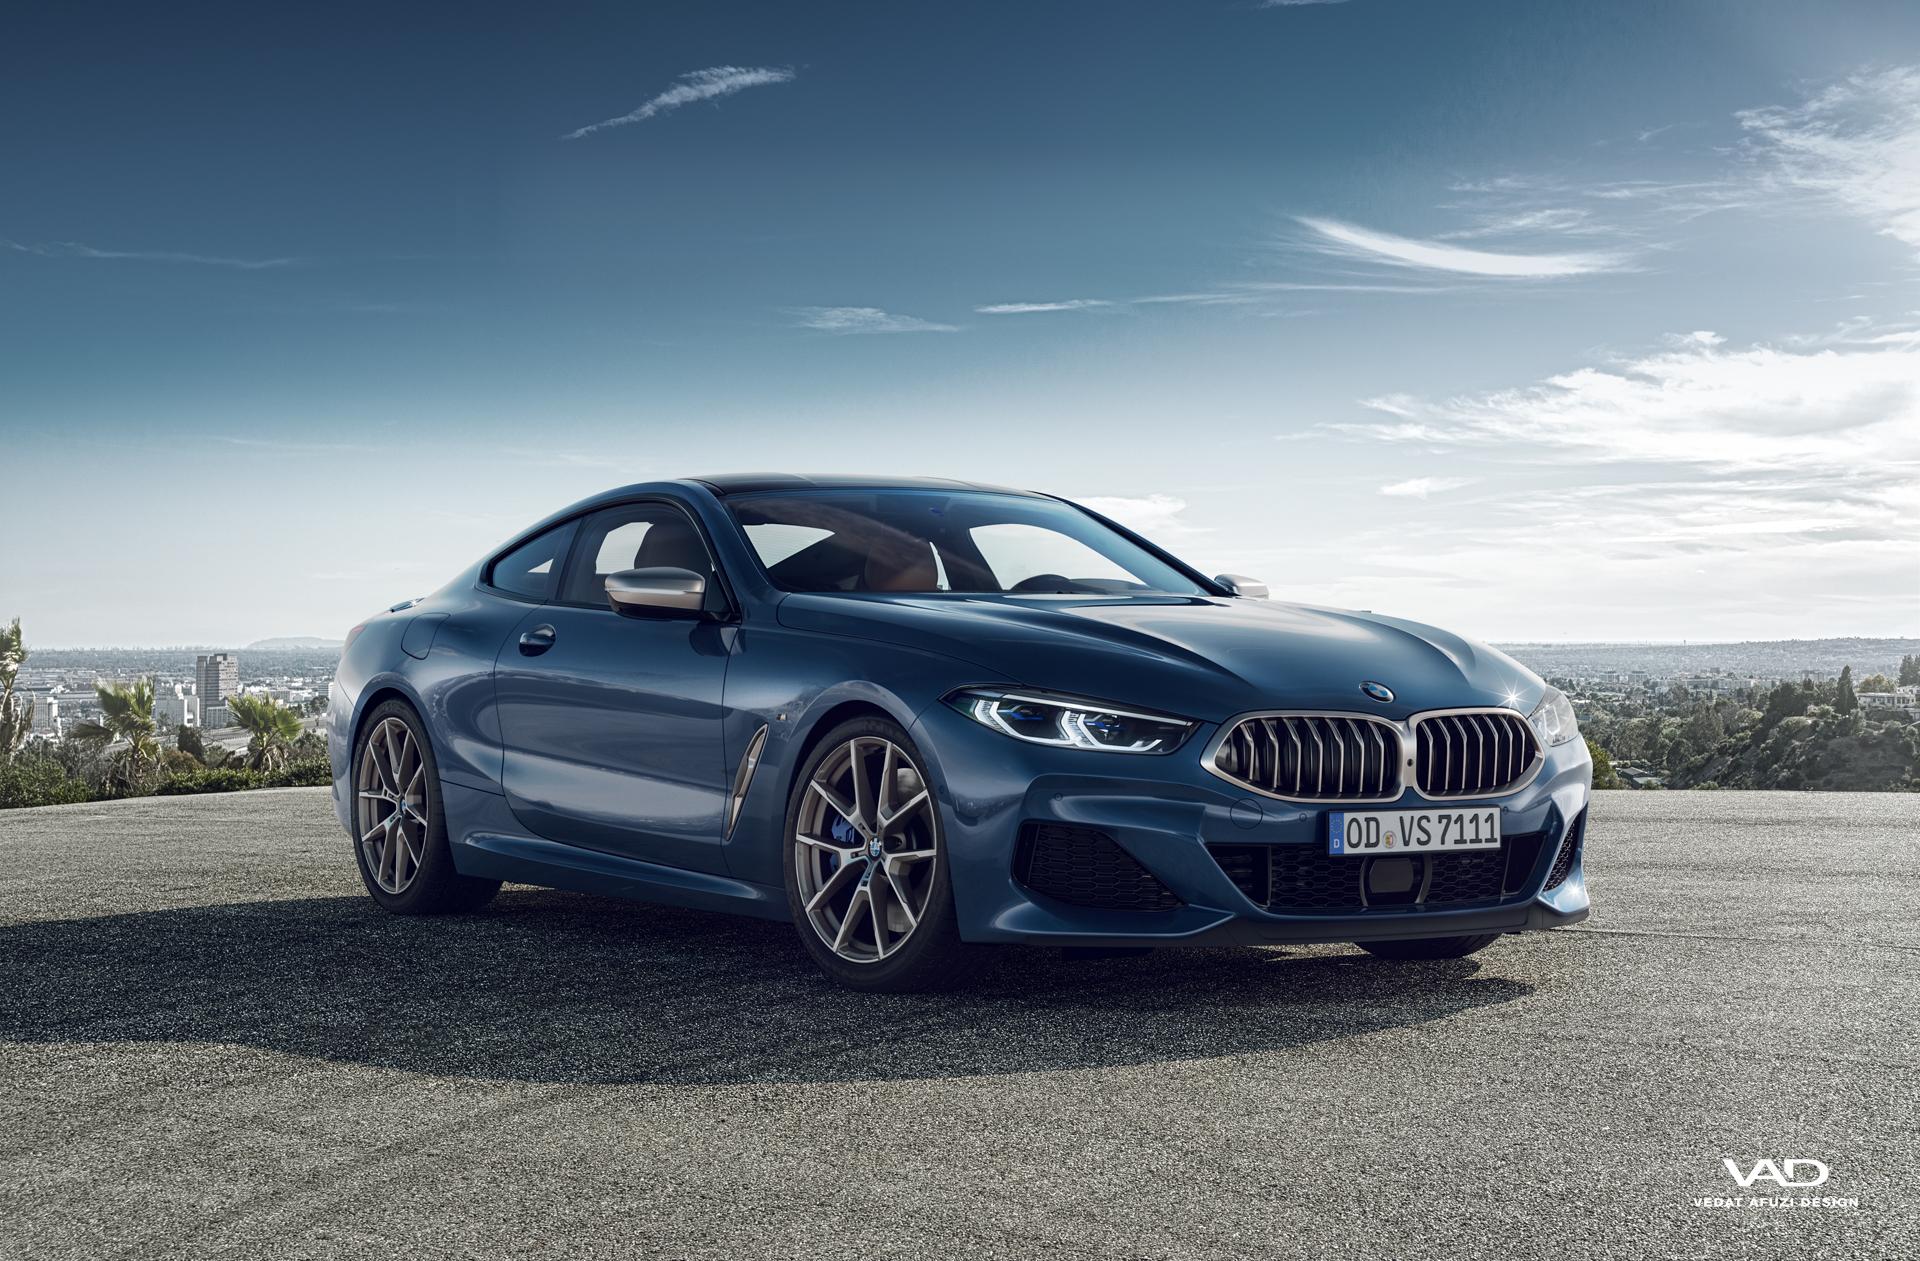 BMW 850i CGI and Backplate